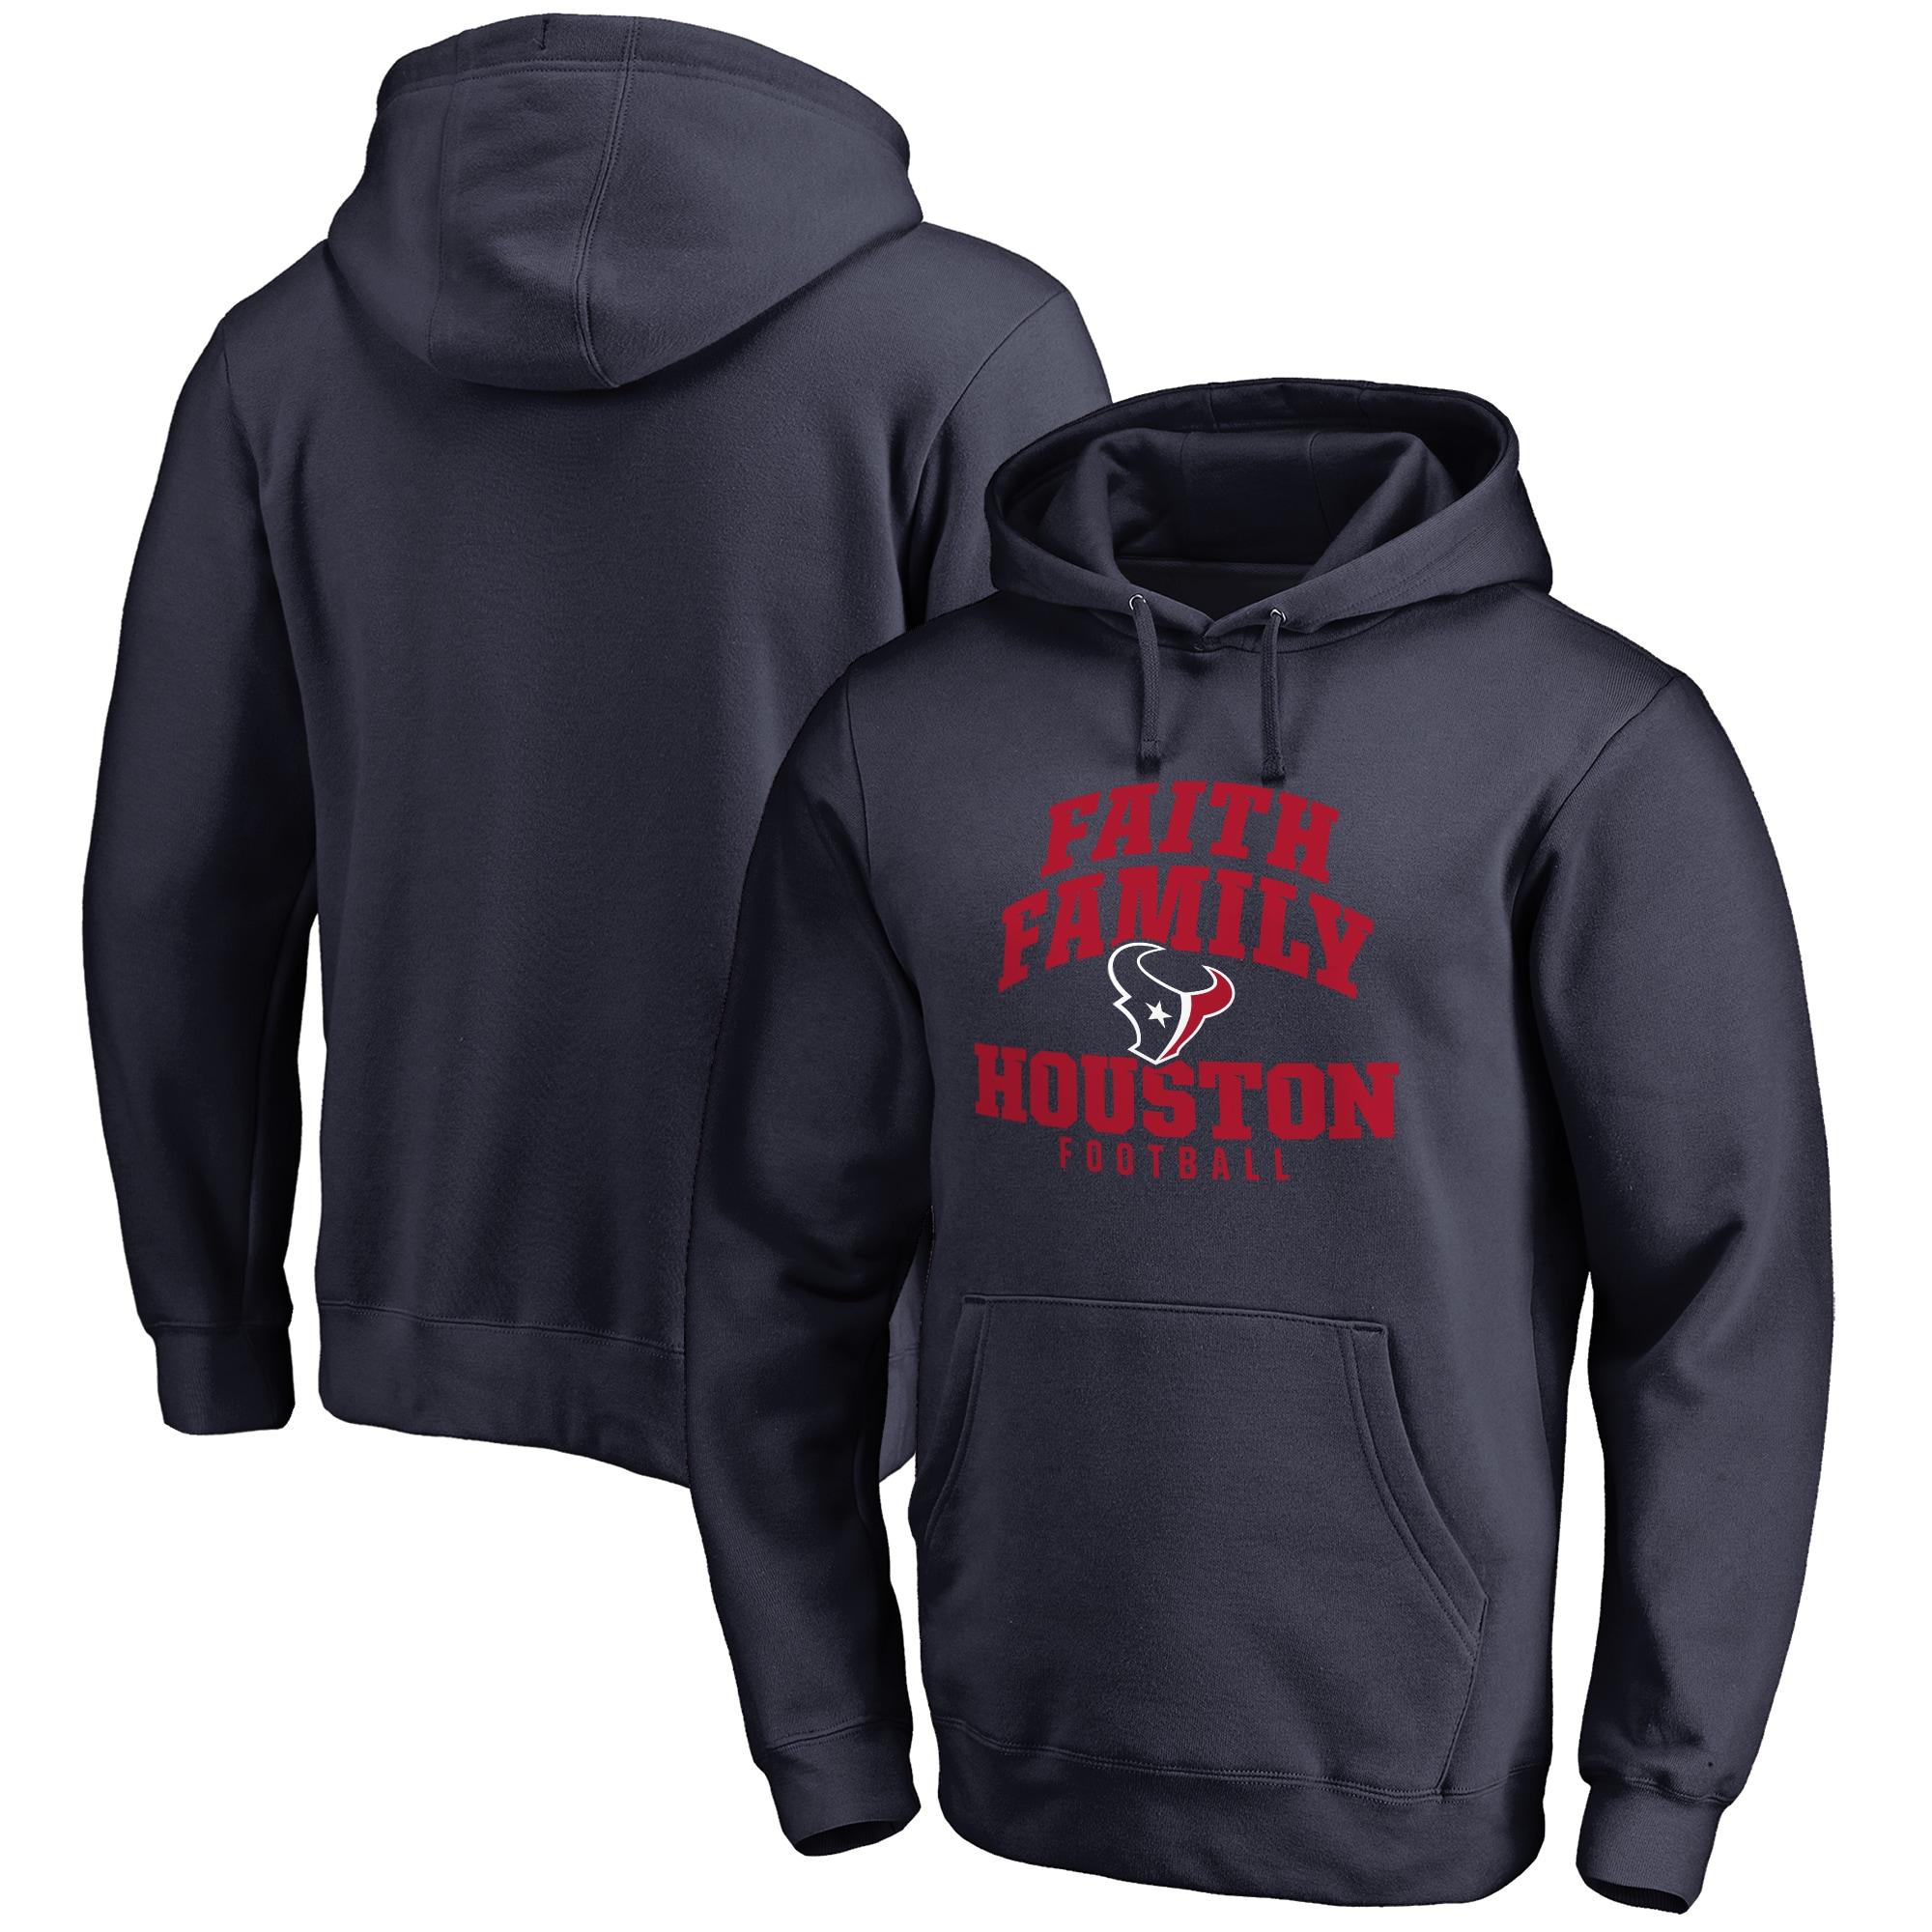 Houston Texans NFL Pro Line Faith Family Pullover Hoodie - Navy